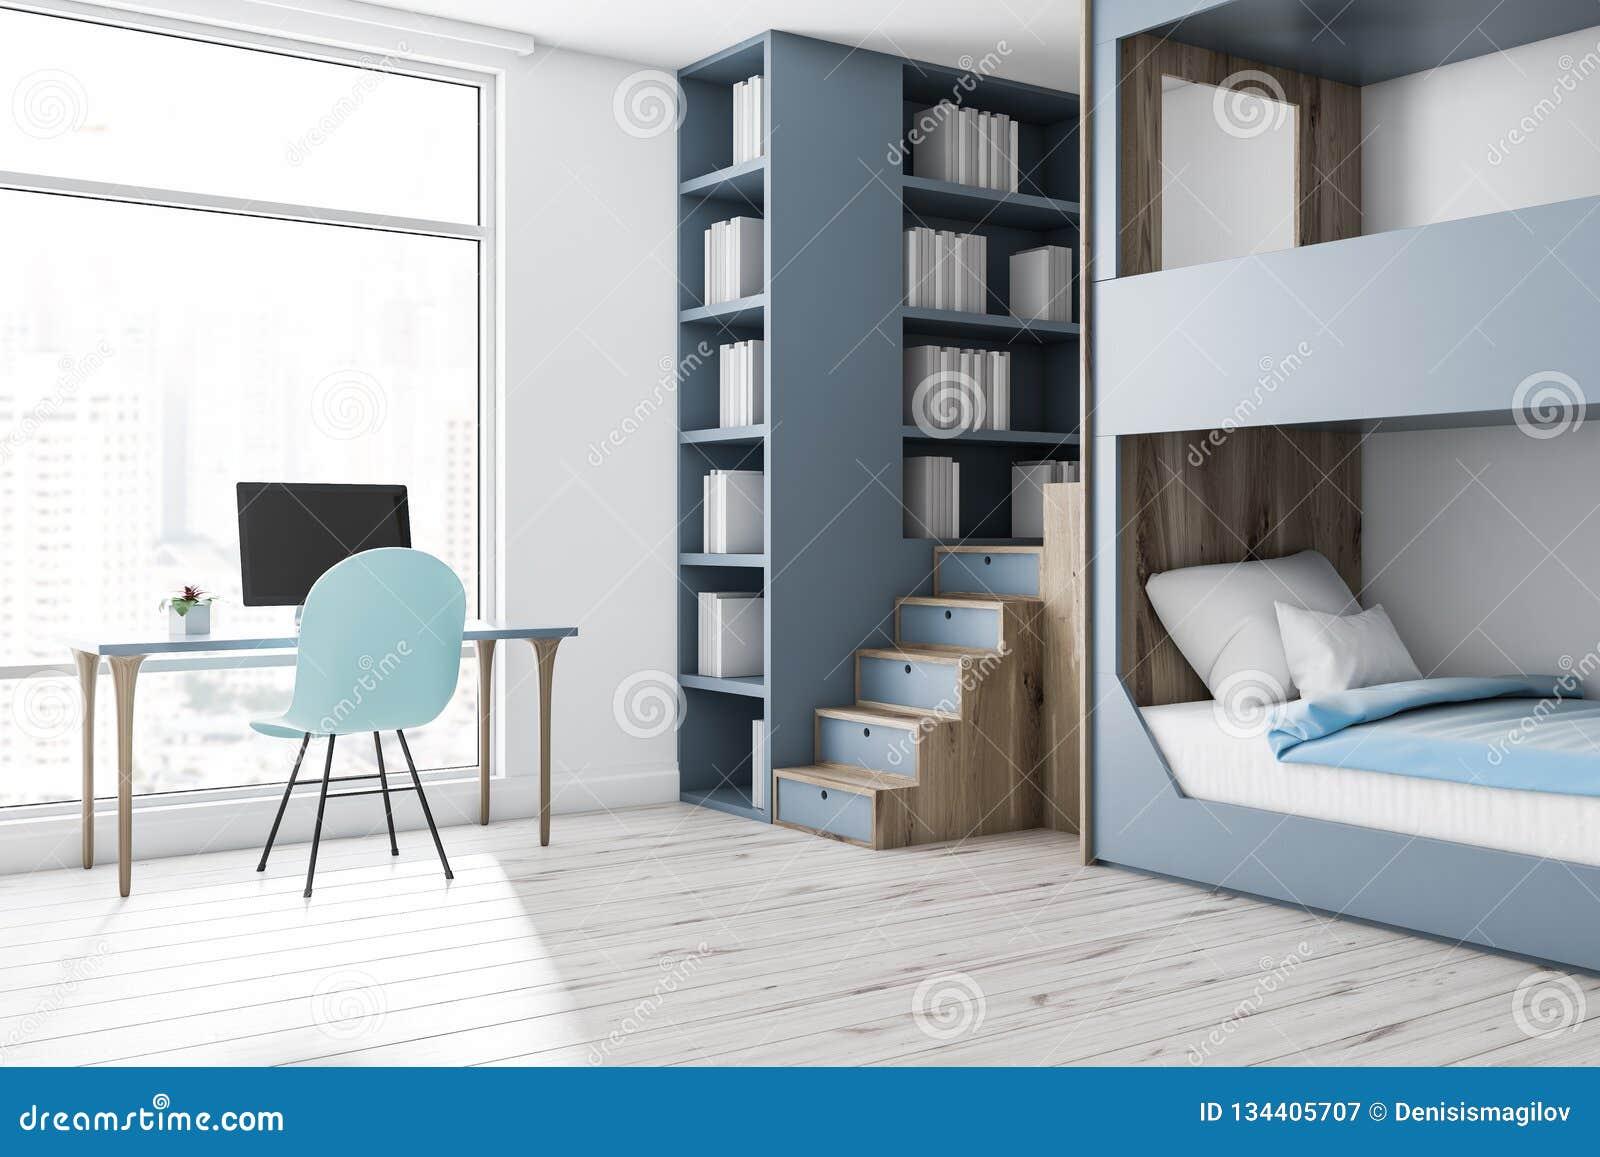 Picture of: Gray Bunk Bed Bedroom Corner Computer Desk Stock Illustration Illustration Of Nightstand Dormitory 134405707